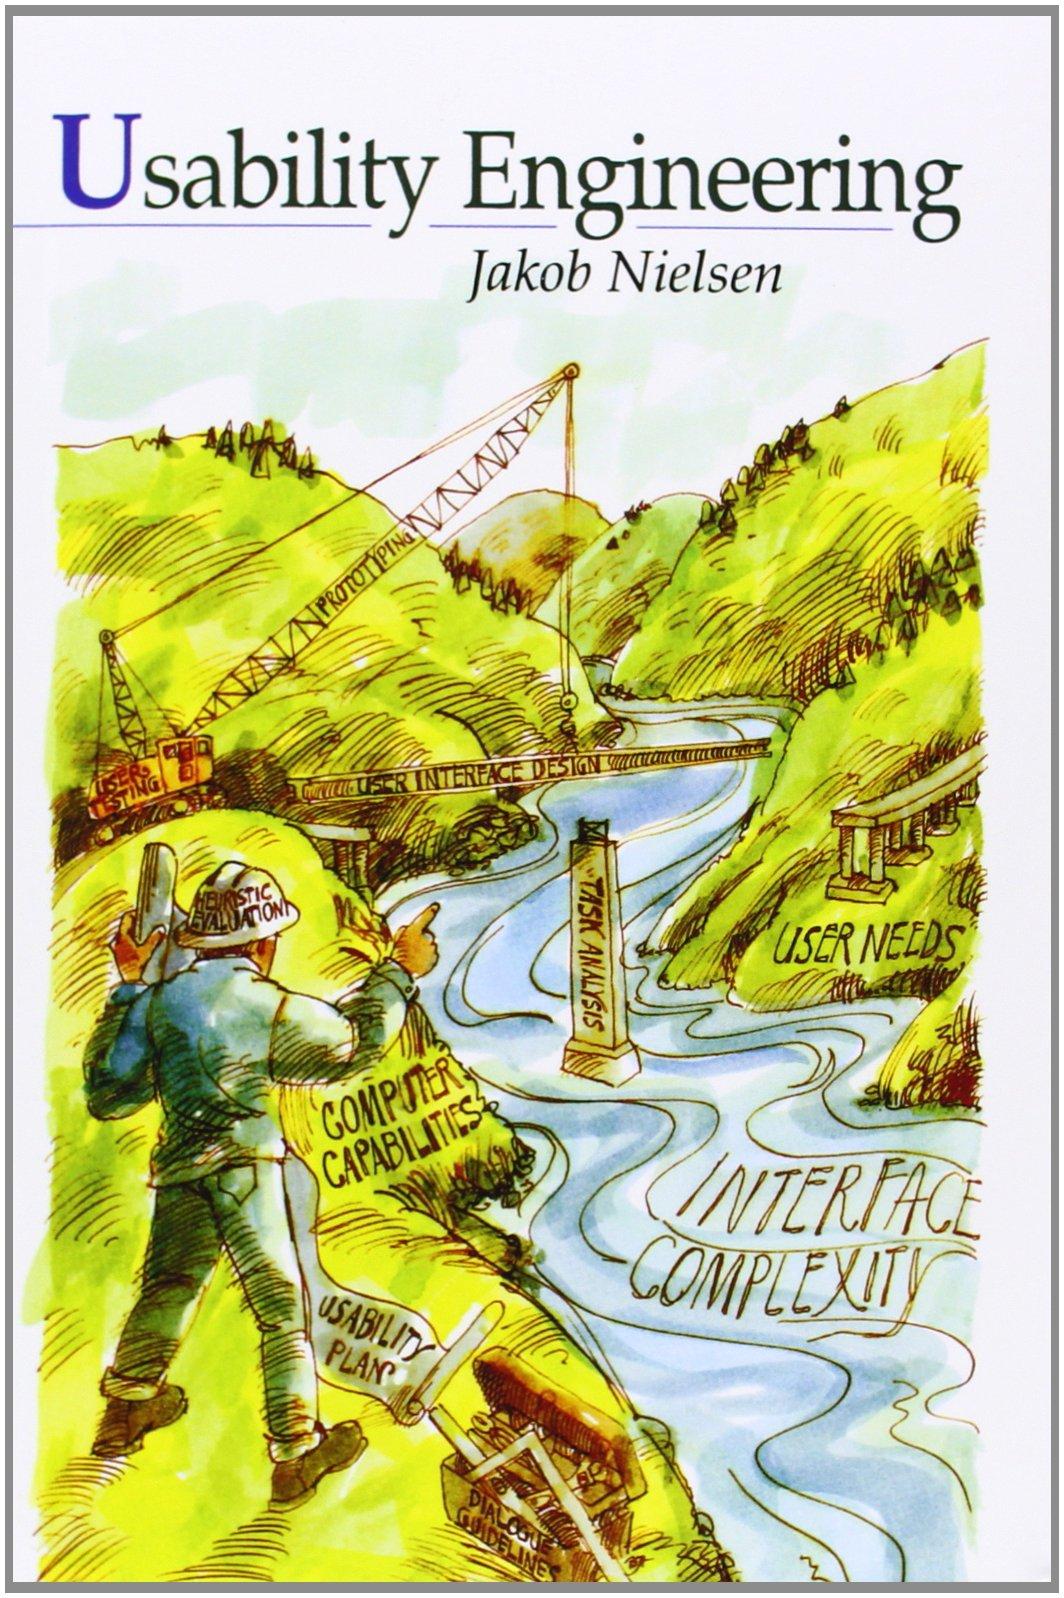 usability engineering by jakob nielsen ebook